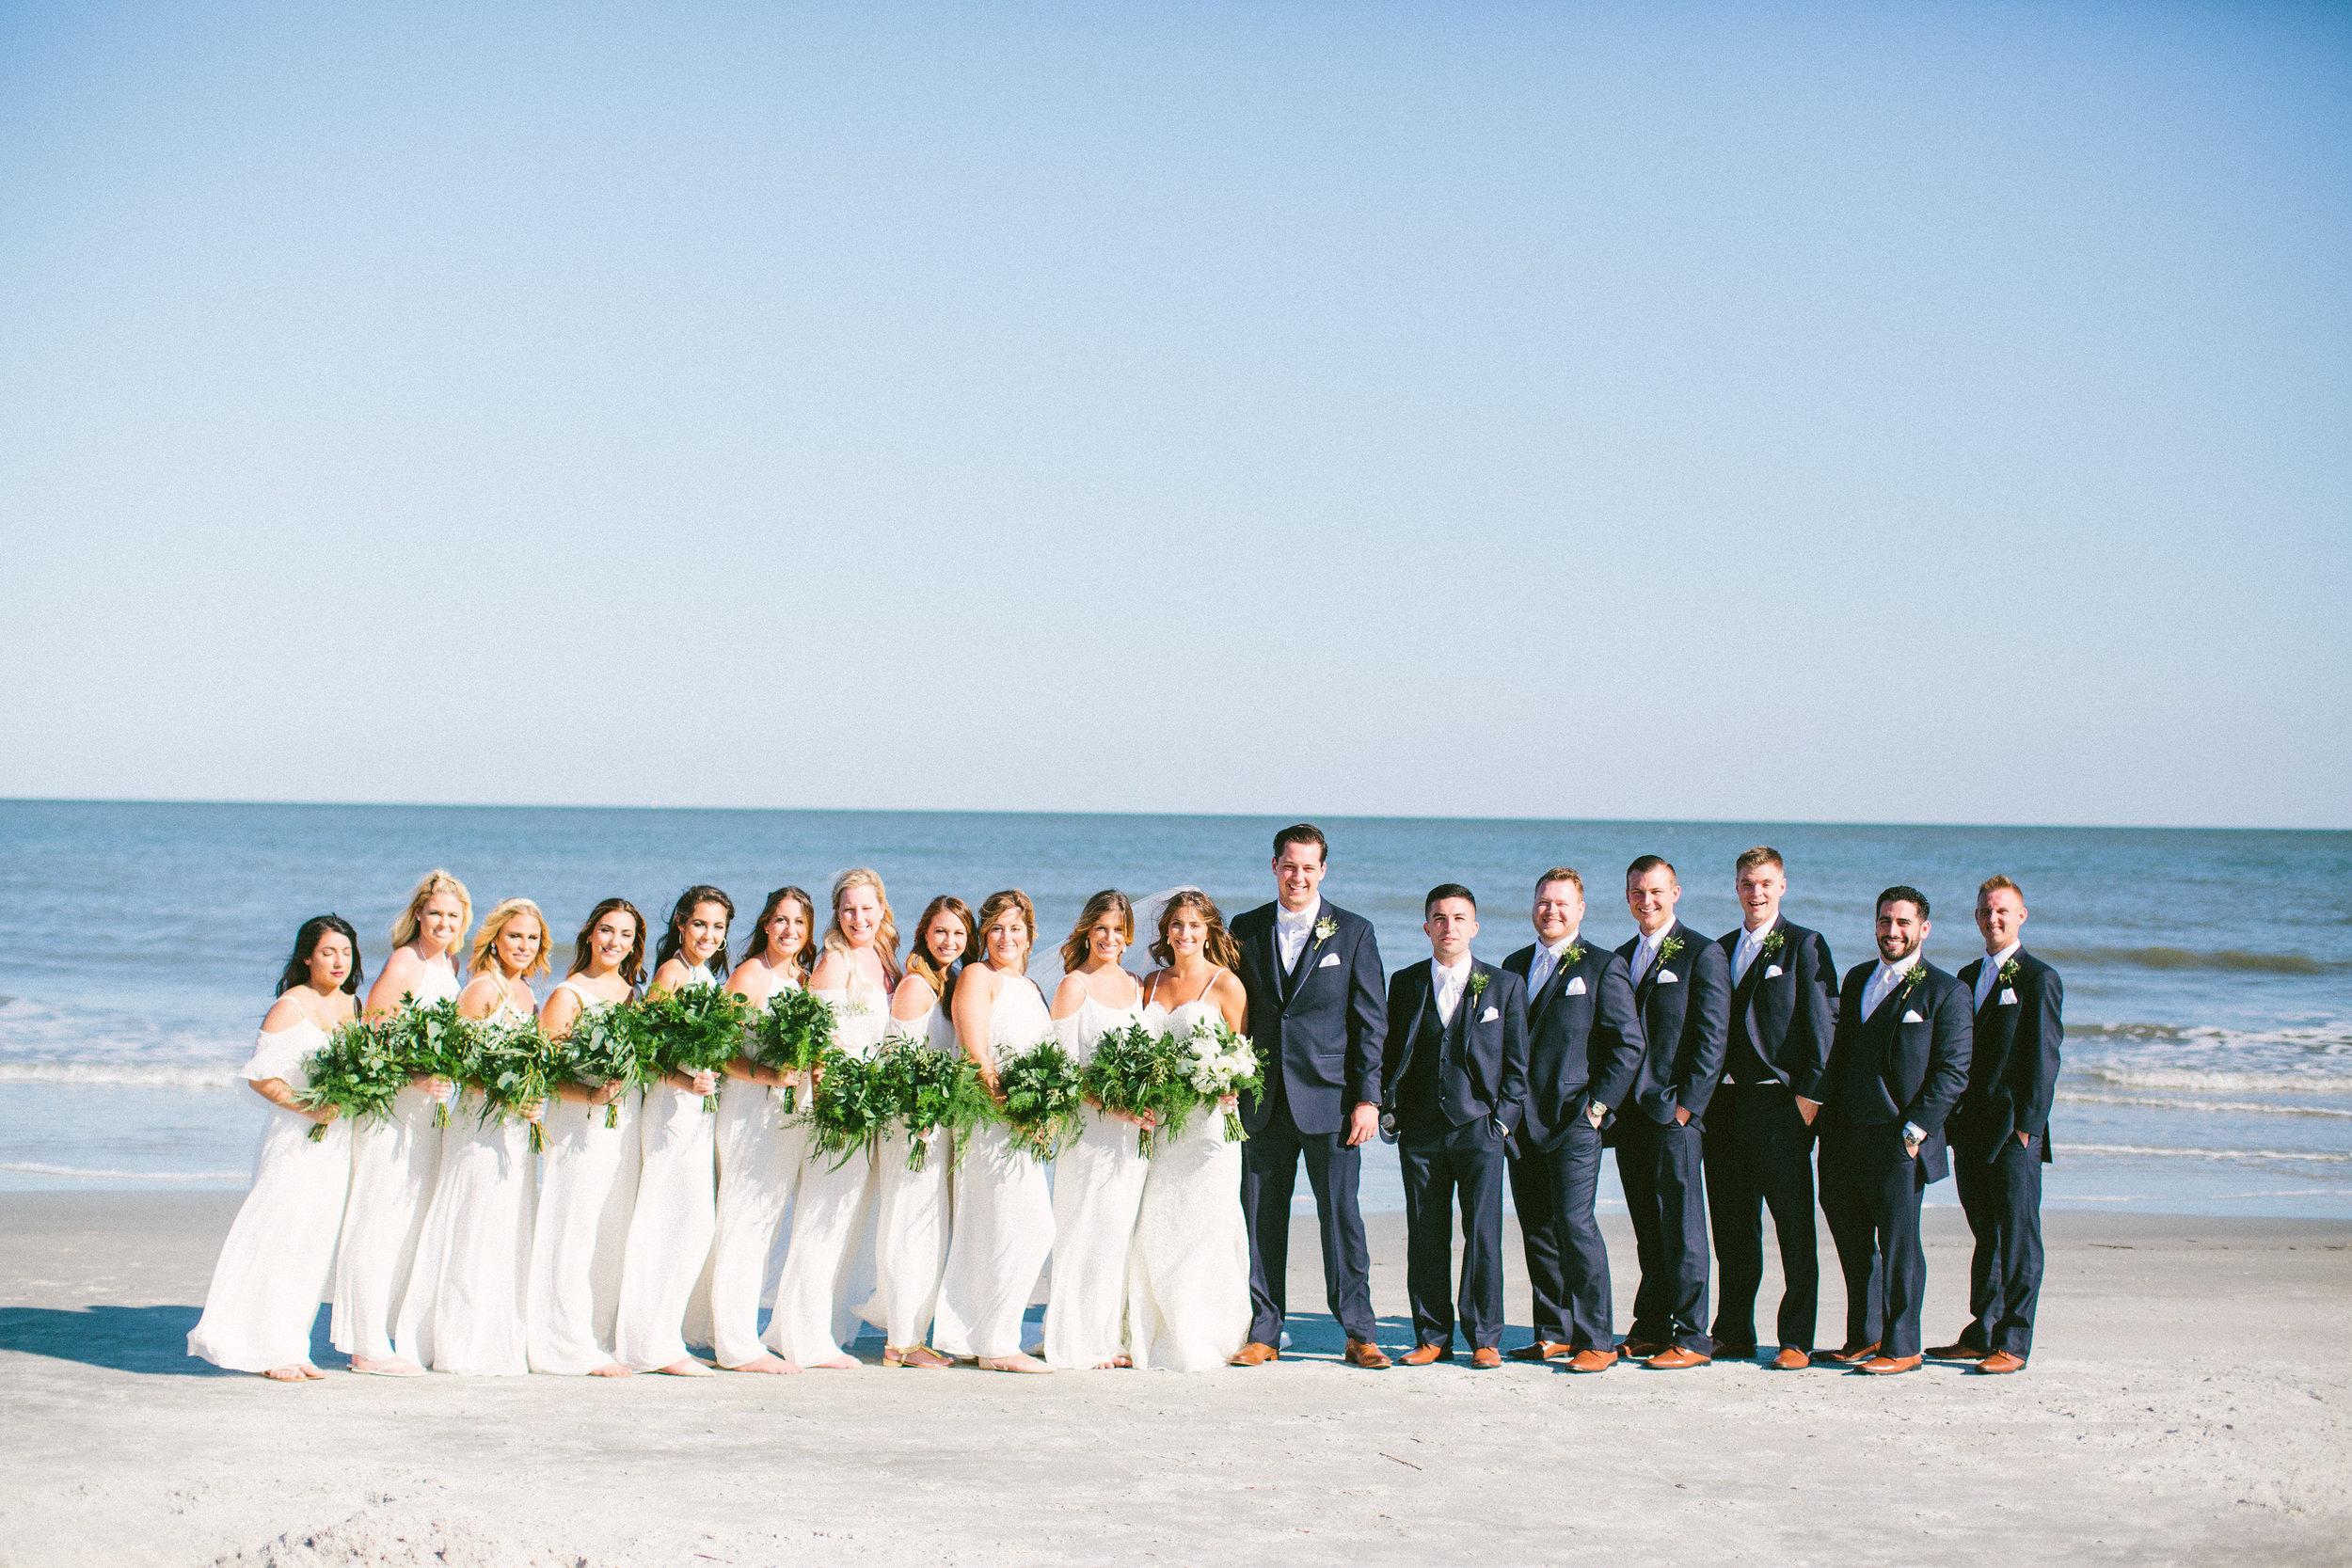 Korte_Shiner_TaylorRaePhotography_WeddingParty127.jpg